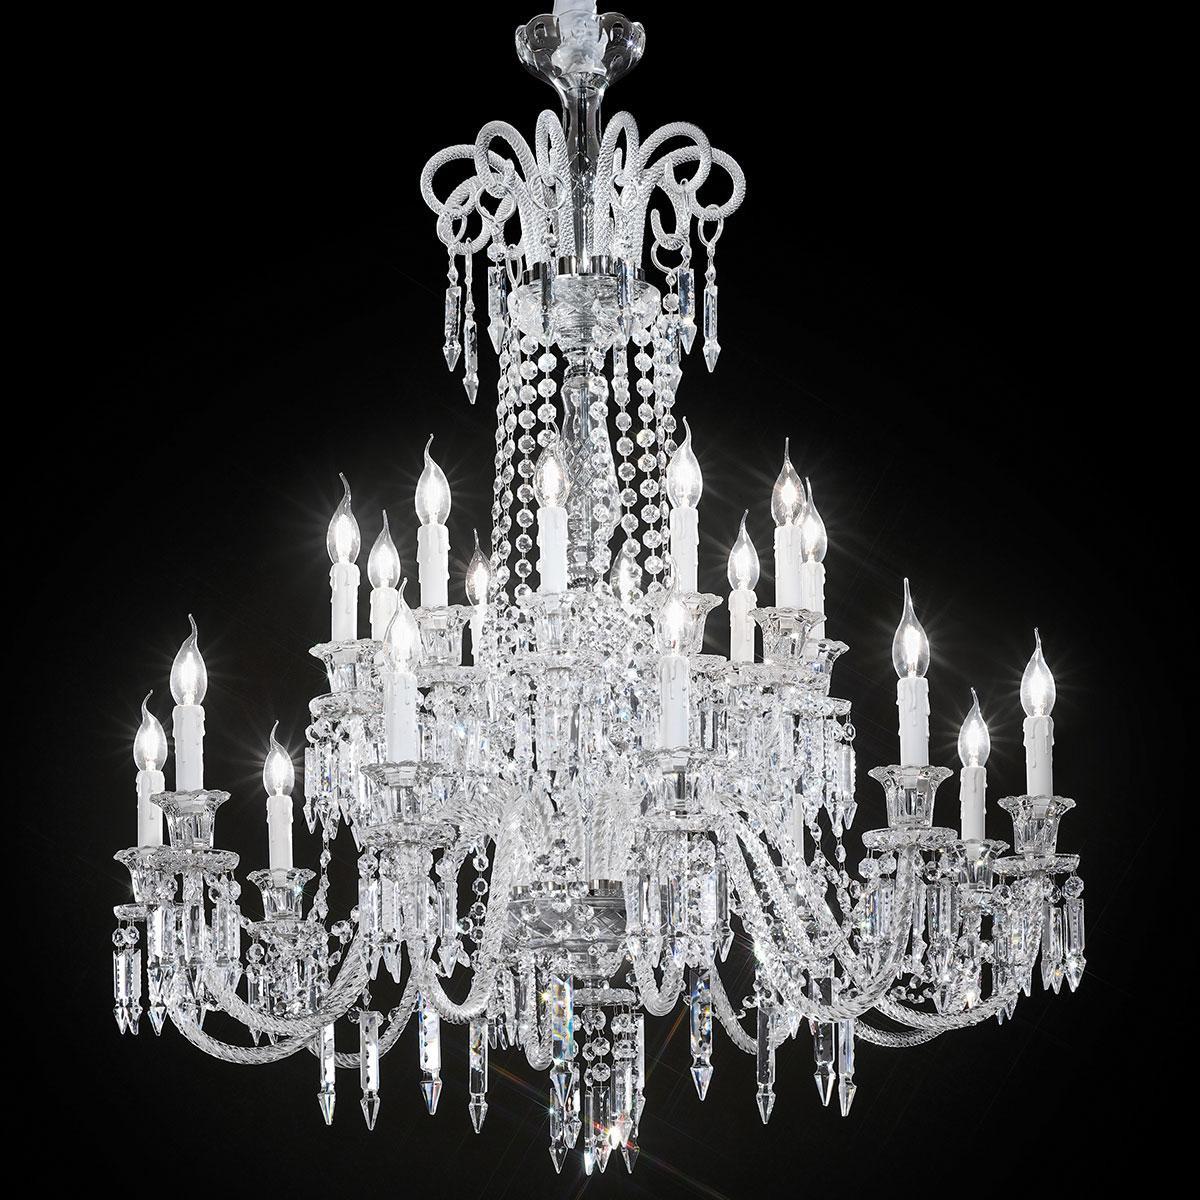 """Cima"" große venezianischer kristall kronleuchter - 10+10 flammig - transparent"